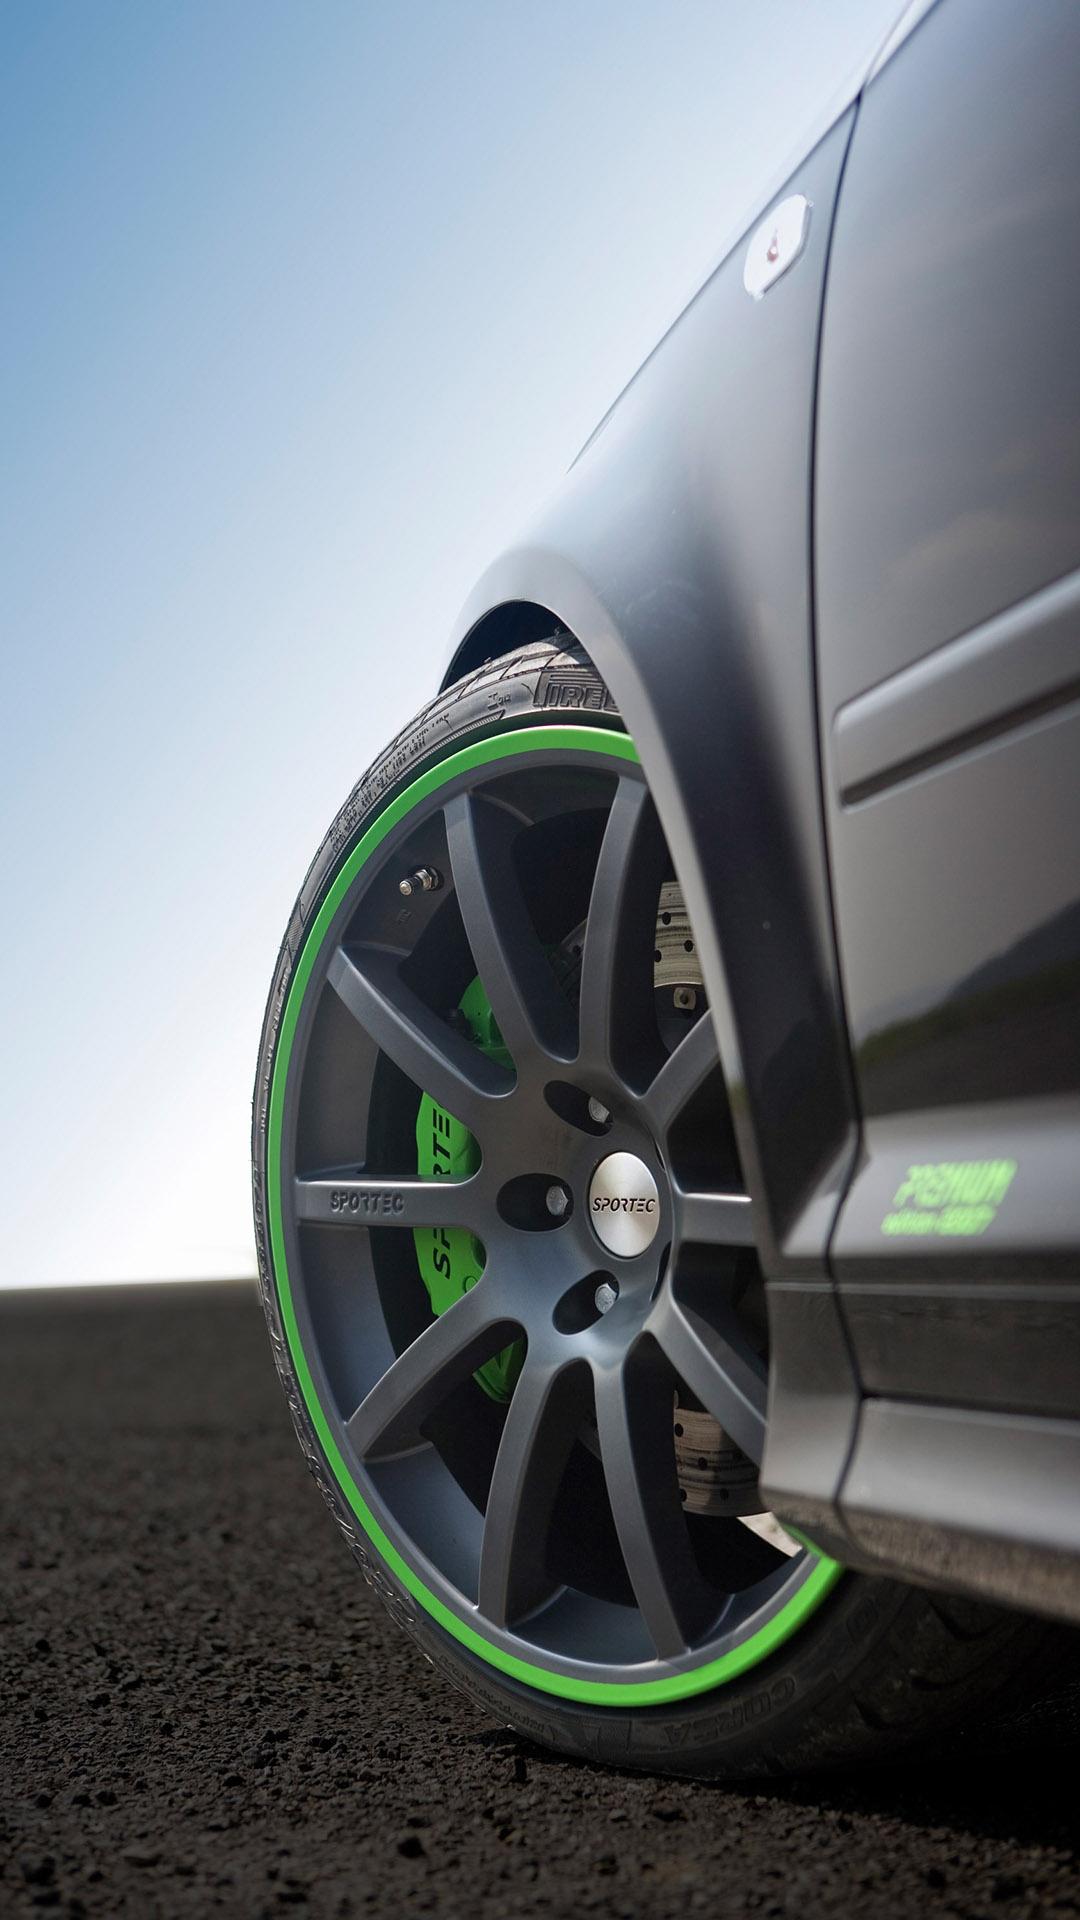 Fondo de pantalla de coche con llantas verdes